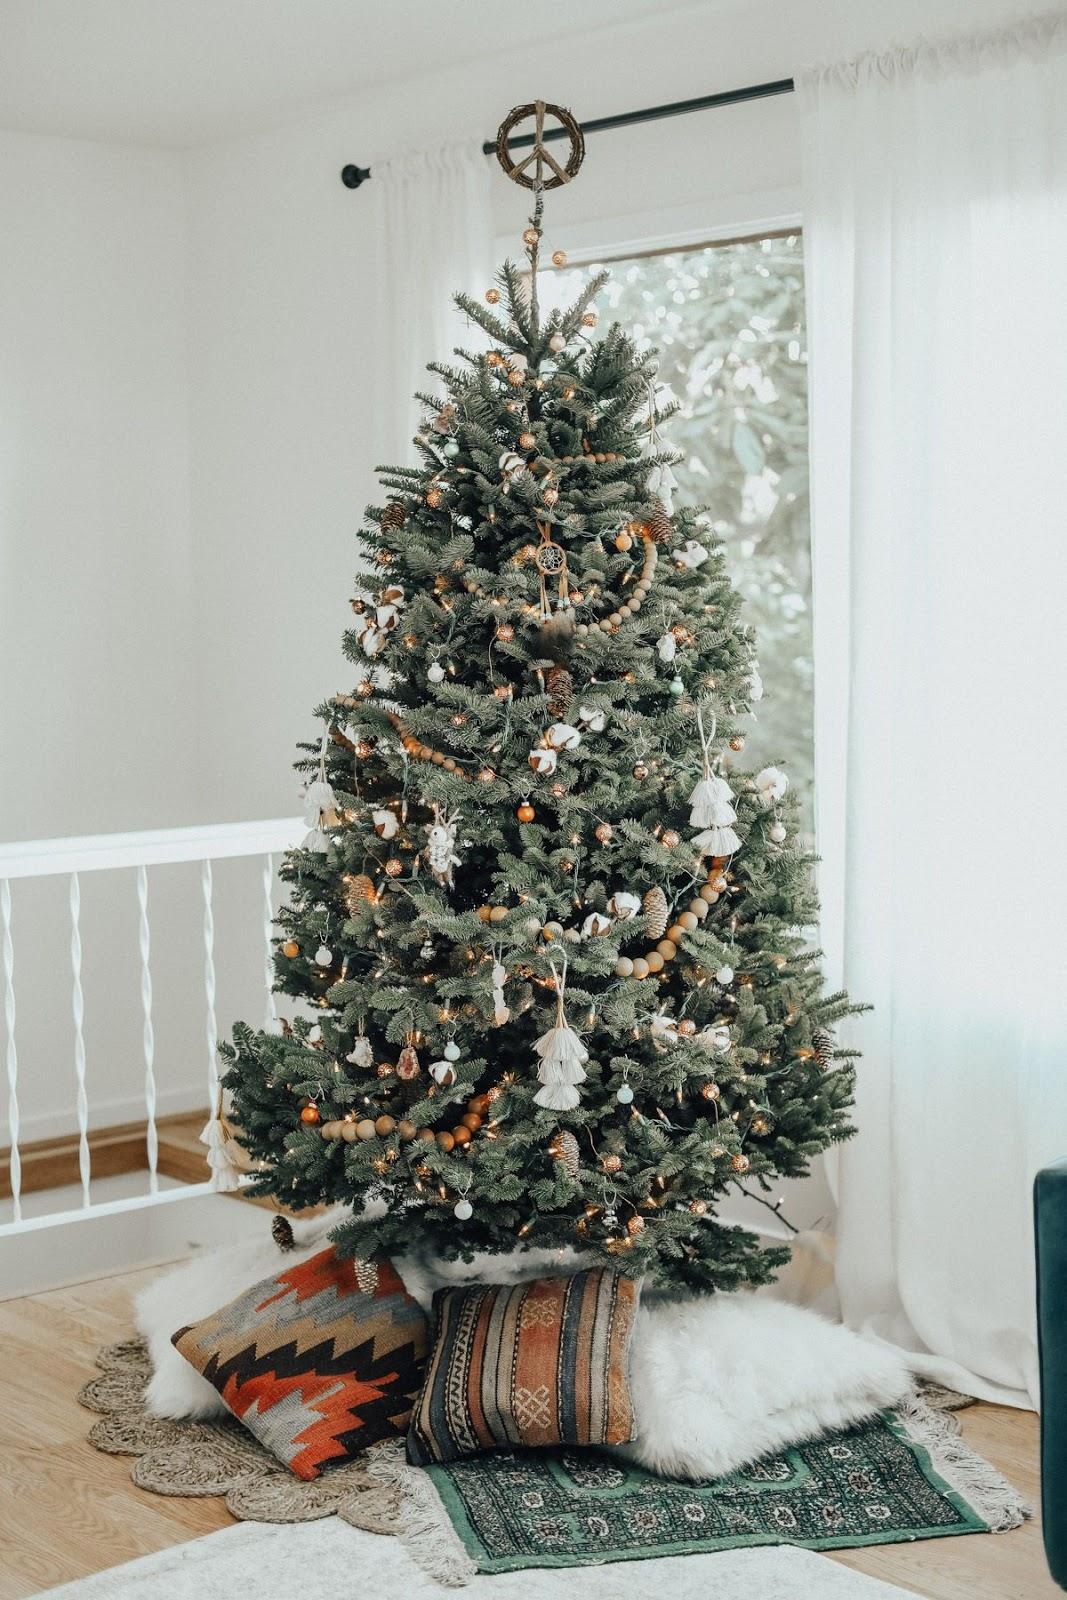 100+ Home Decoration Ideas for Christmas 2019